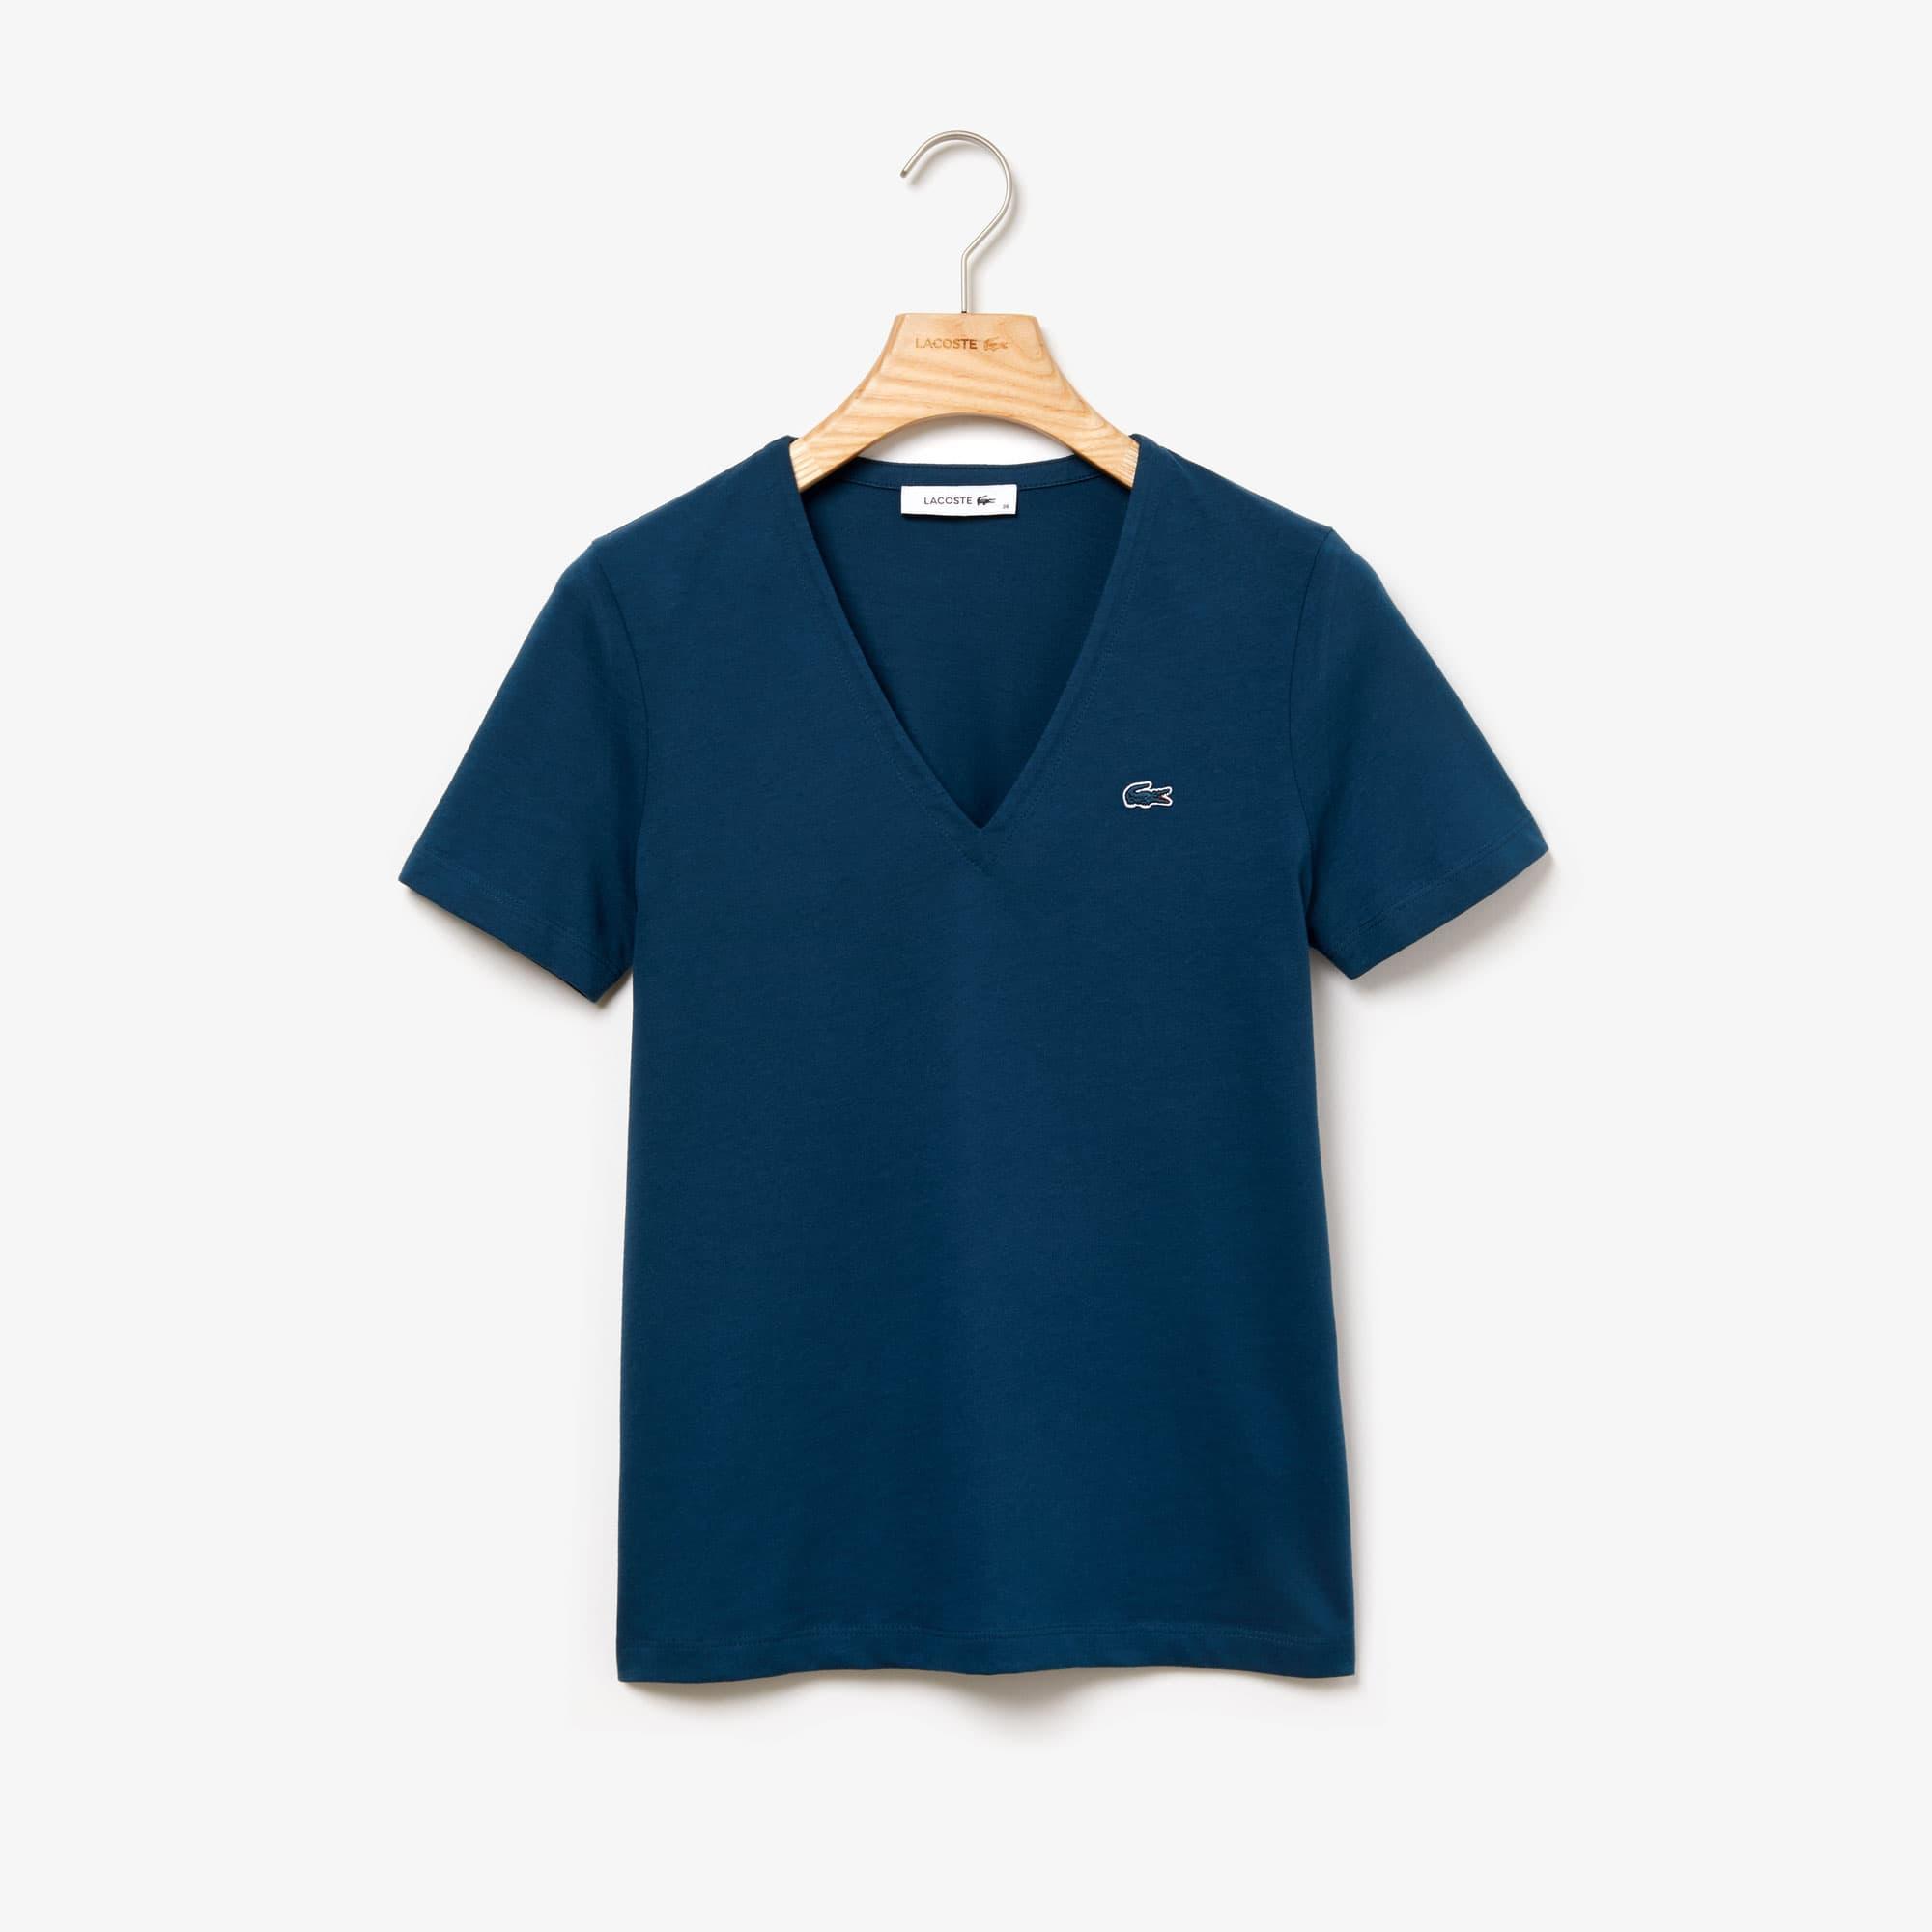 Lacoste Tops Women's Slim Fit V-Neck Cotton Jersey T-shirt